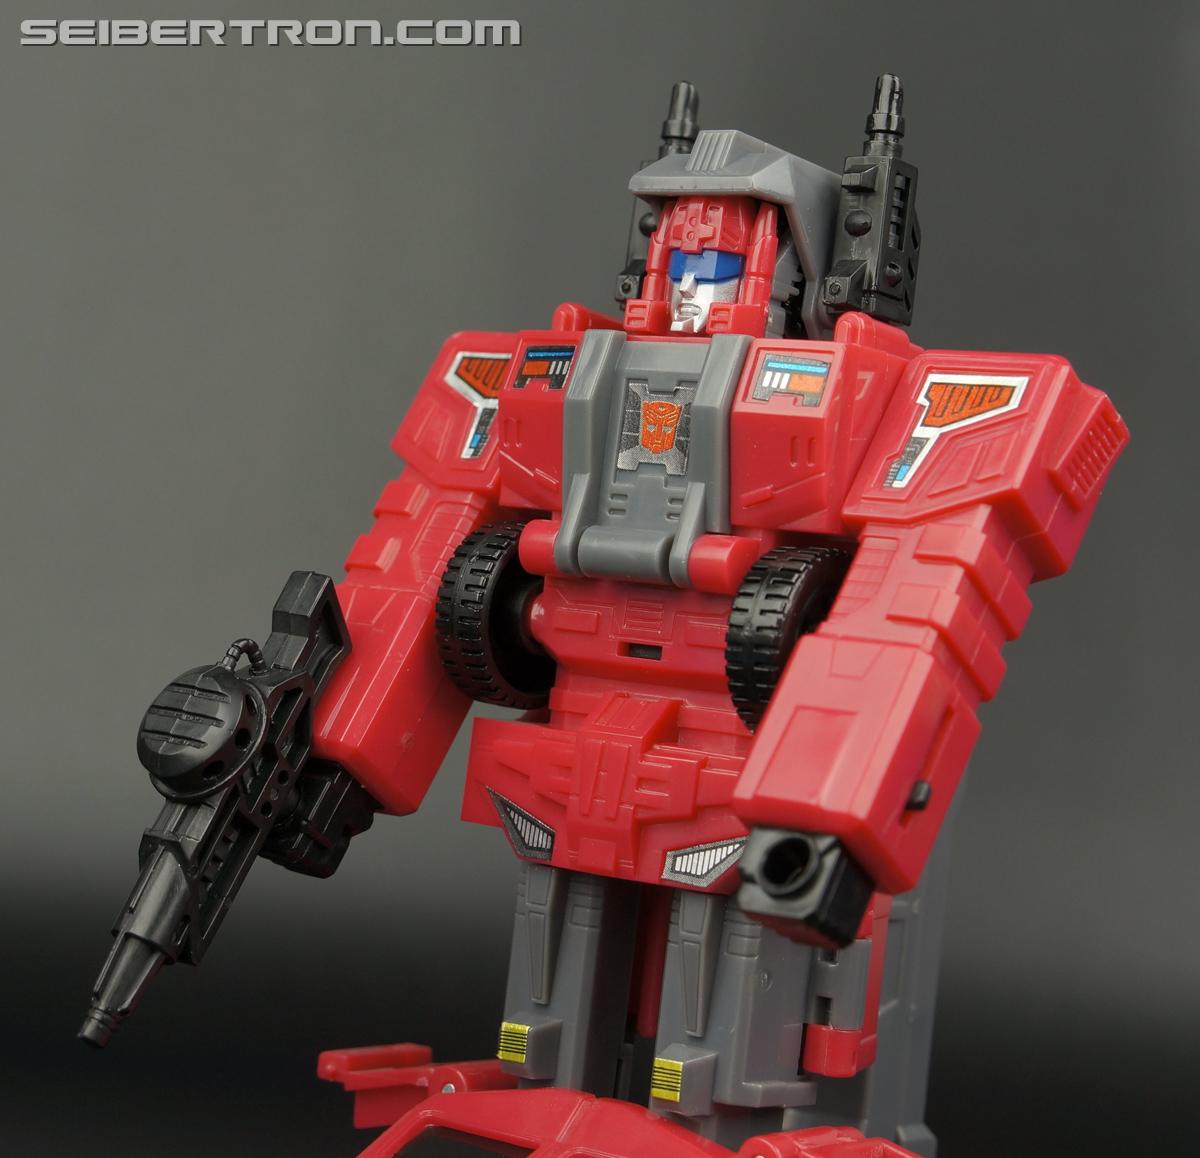 Transformers Super God Masterforce Cab (Transtector) (Image #70 of 111)